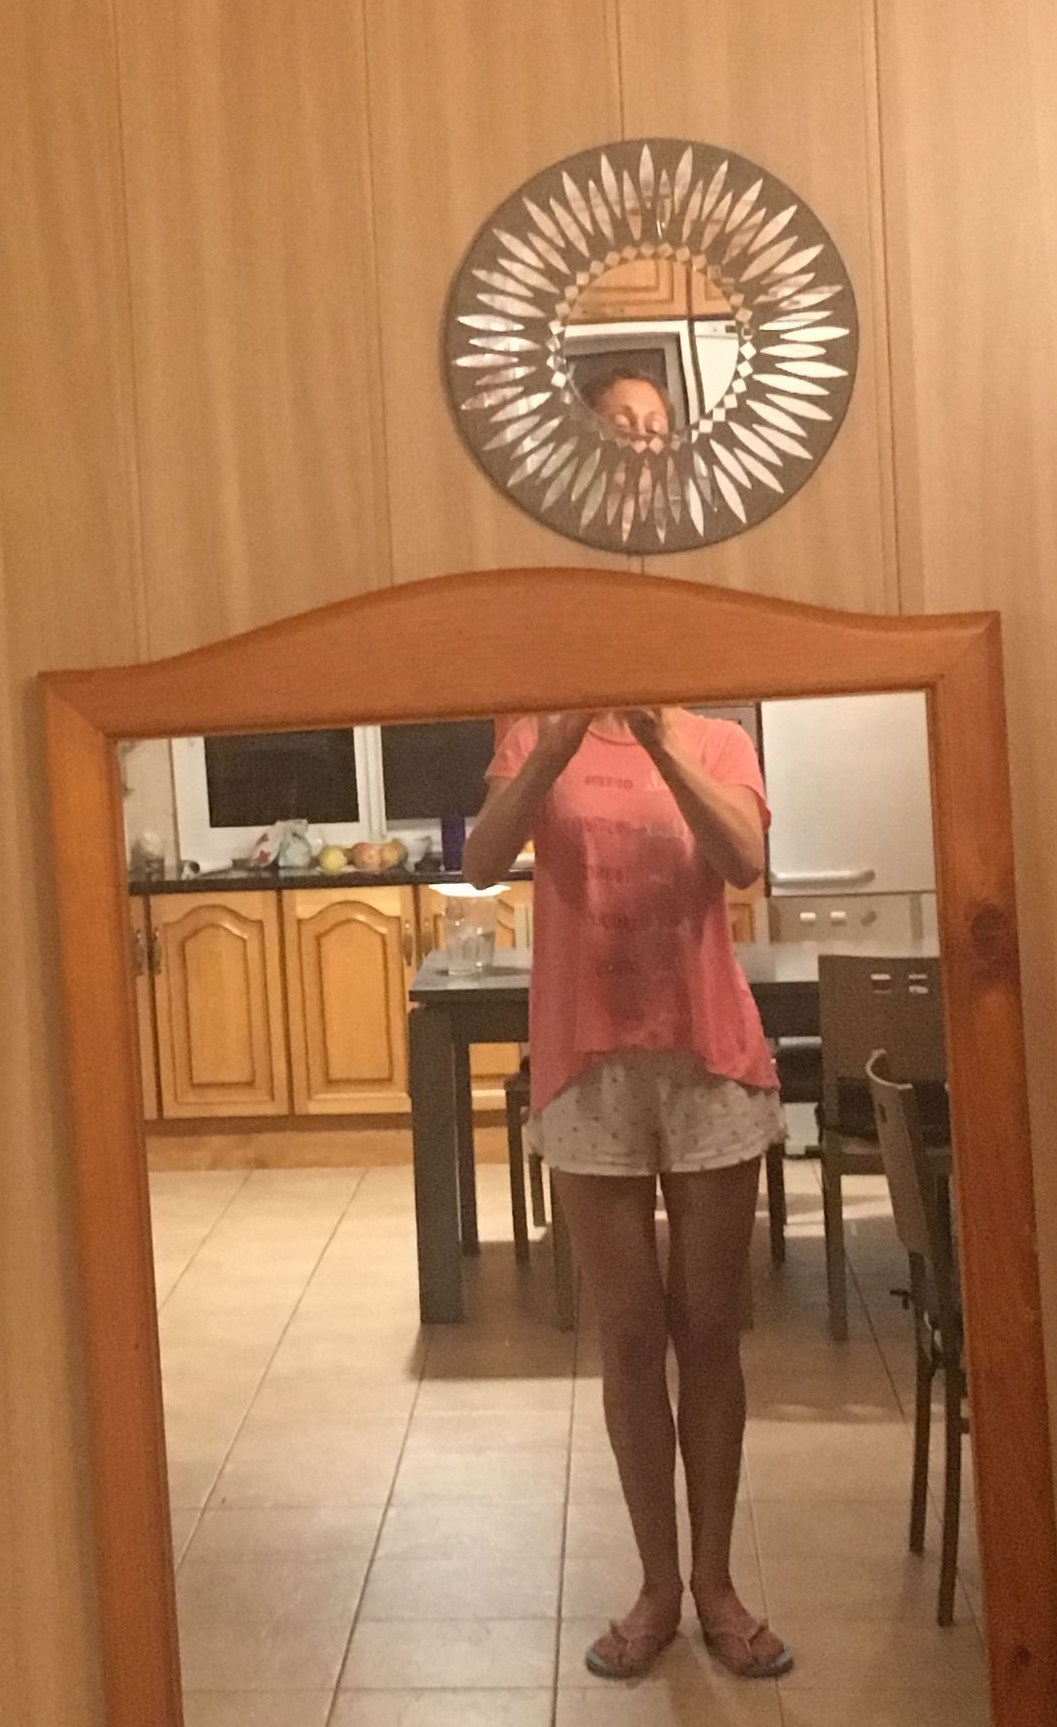 finka-veidrodis.jpg